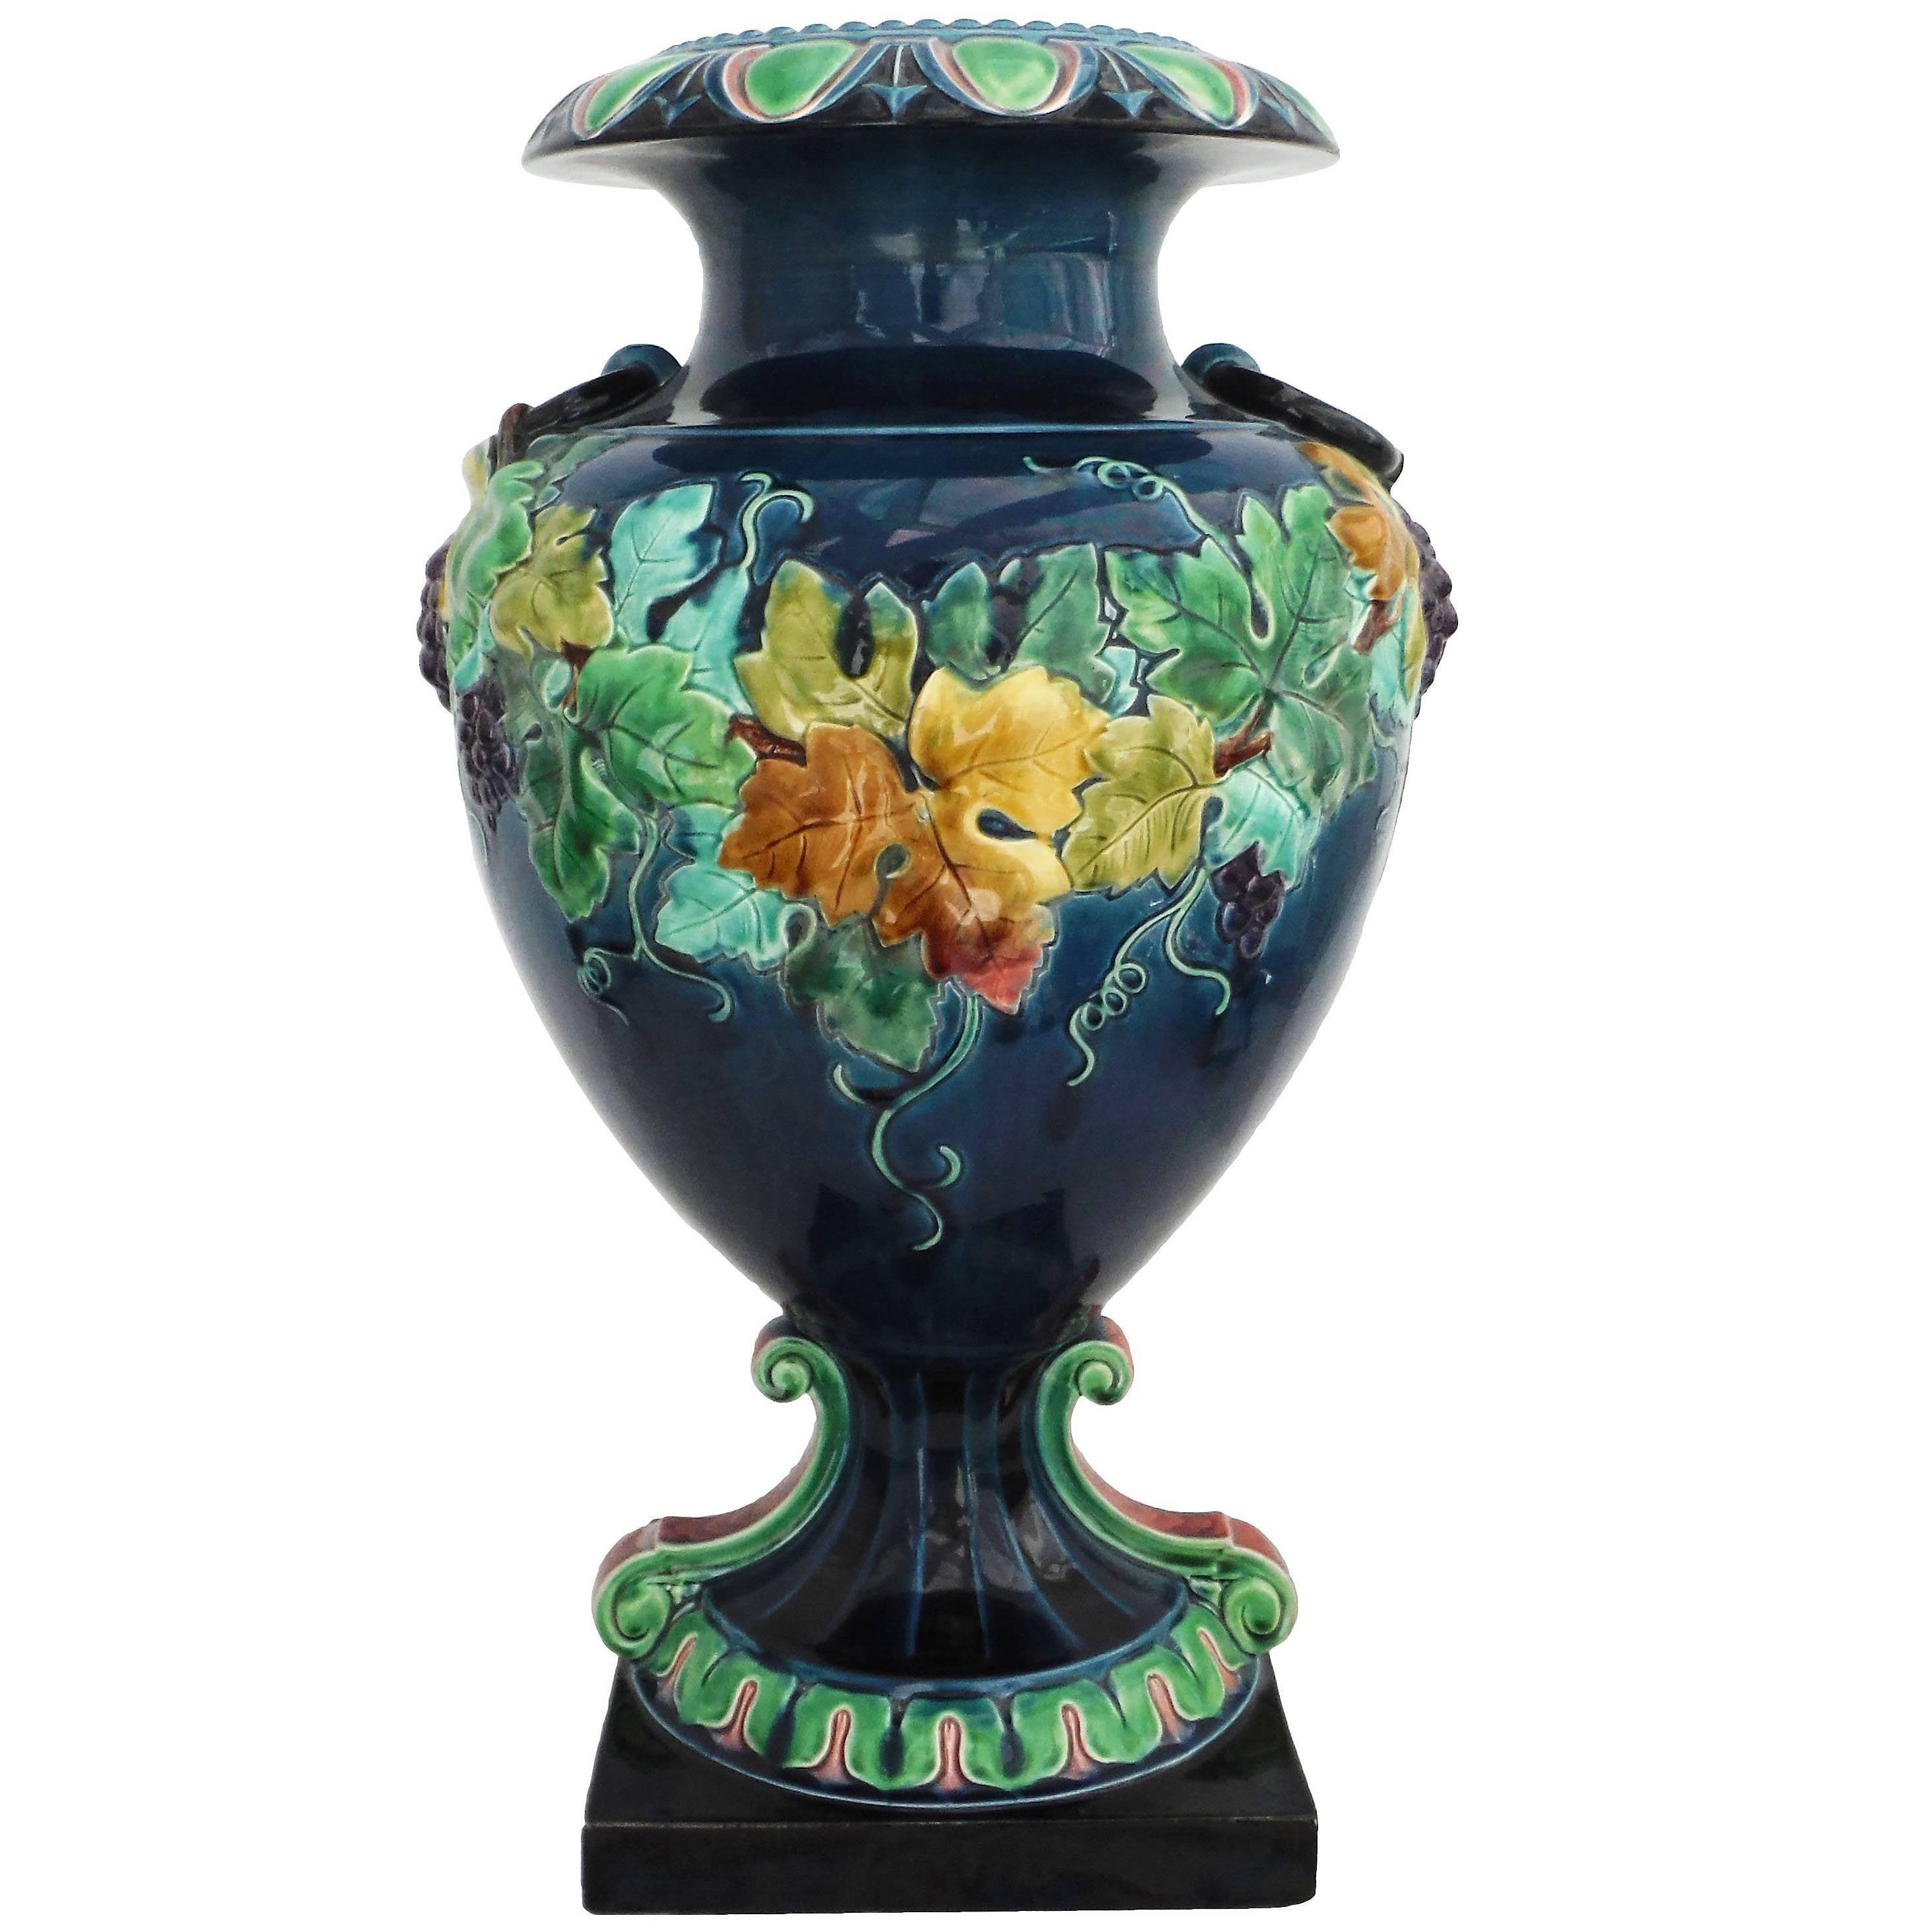 19th French Monumental Renaissance Style Majolica Grapes Blue Vase